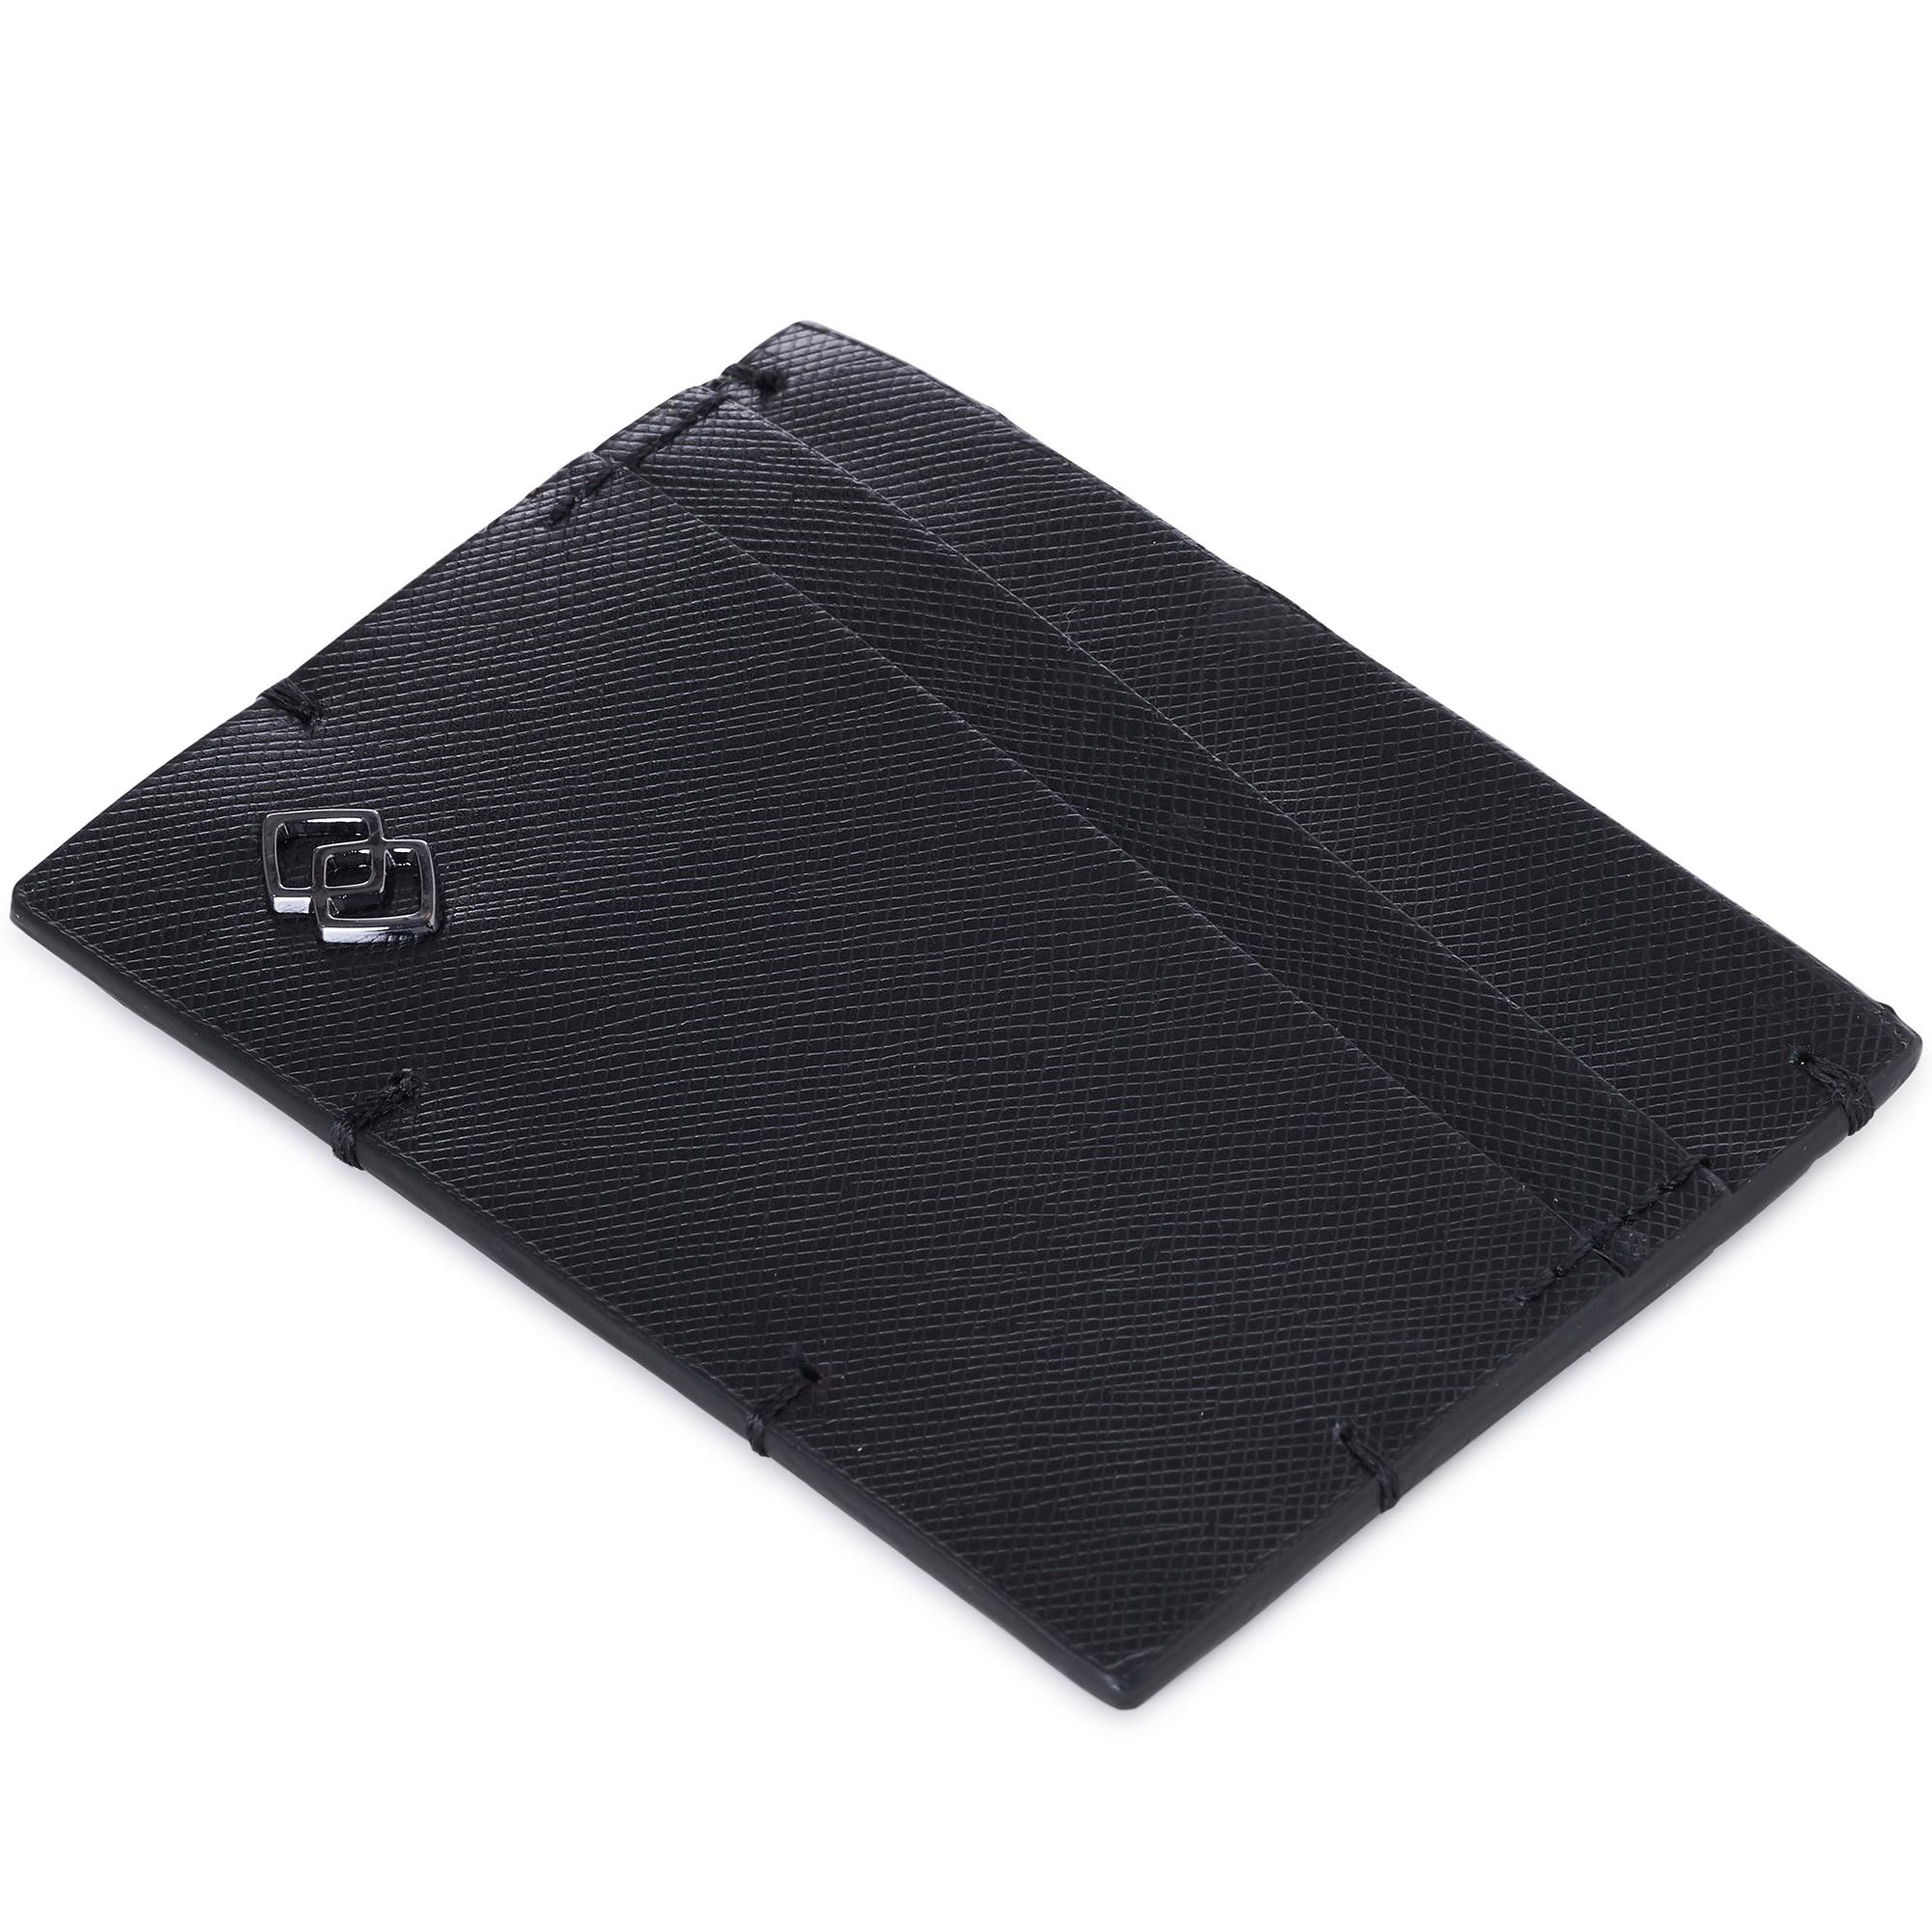 Alpine-Swiss-RFID-Thin-Minimalist-ID-Card-Case-Front-Pocket-Wallets-5-Top-Styles